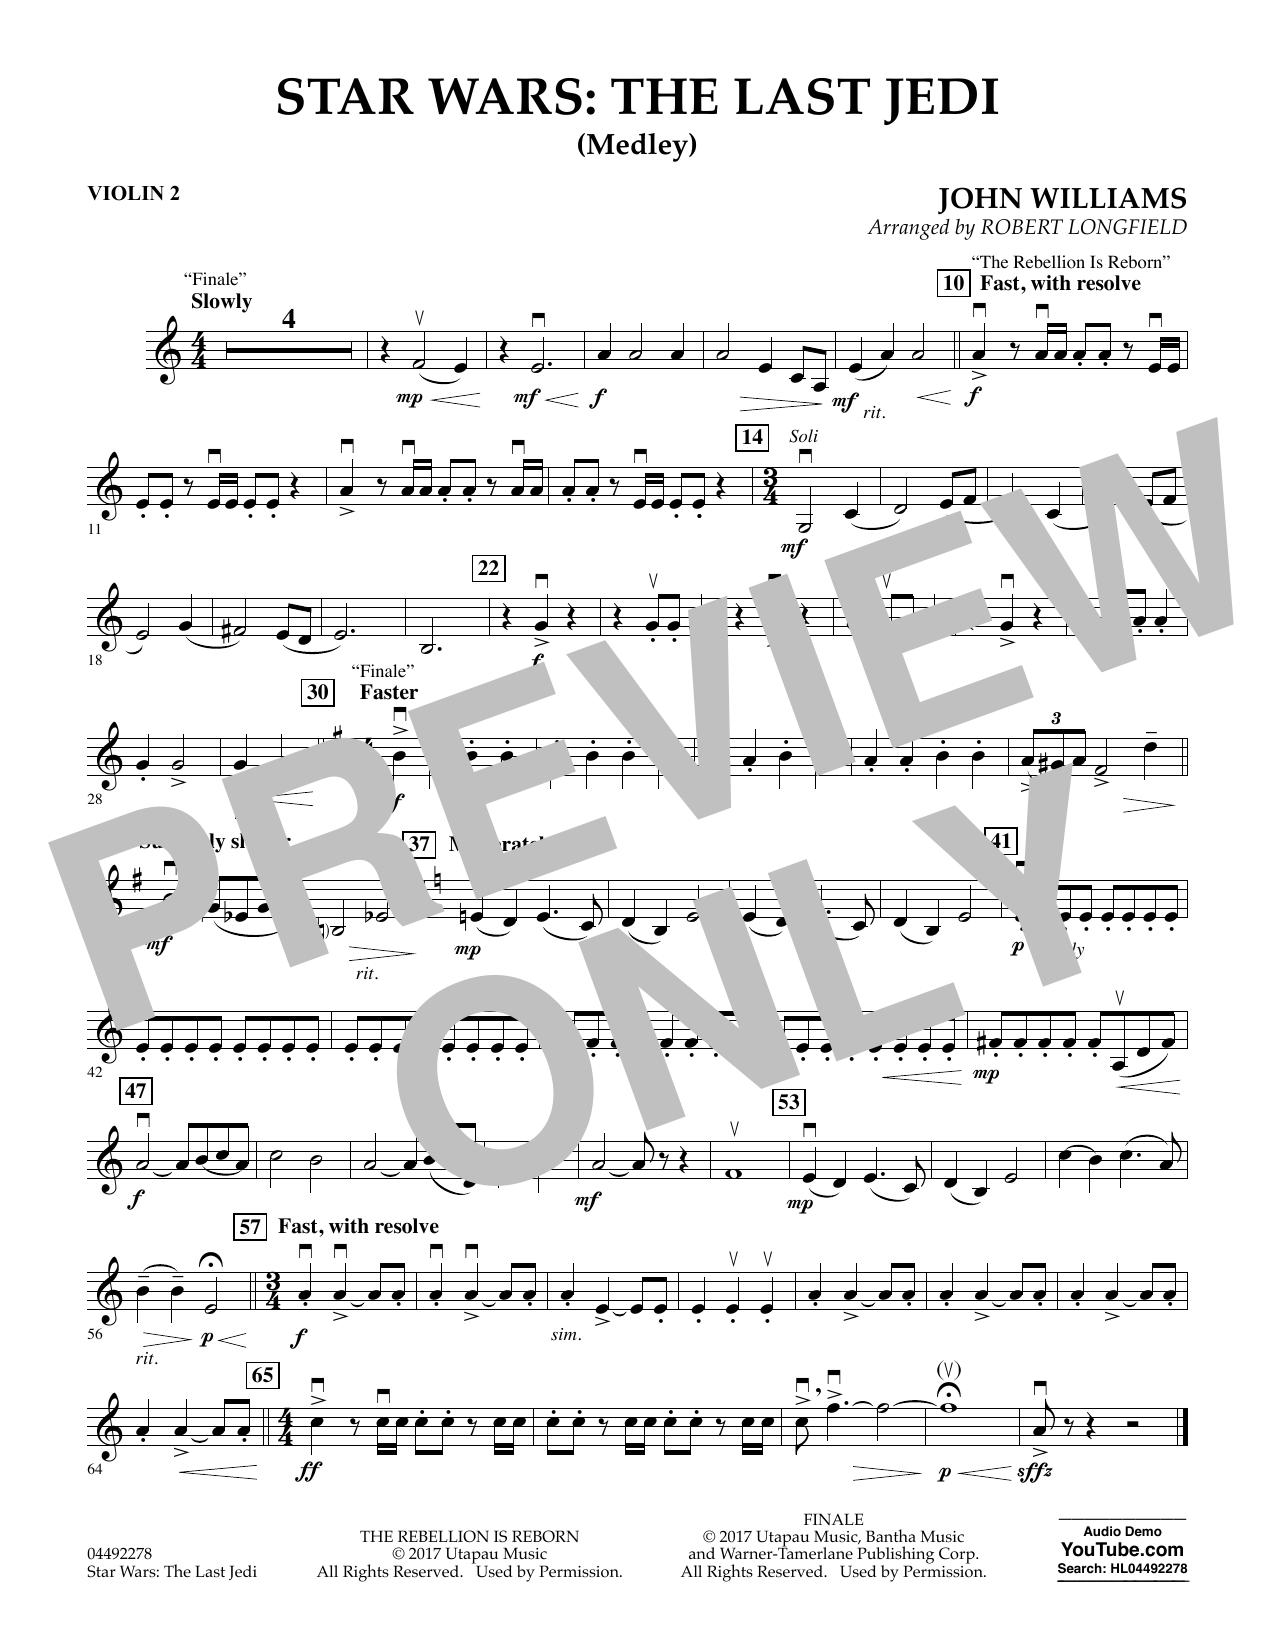 Star Wars: The Last Jedi (Medley) (arr. Robert Longfield) - Violin 2 (Orchestra)